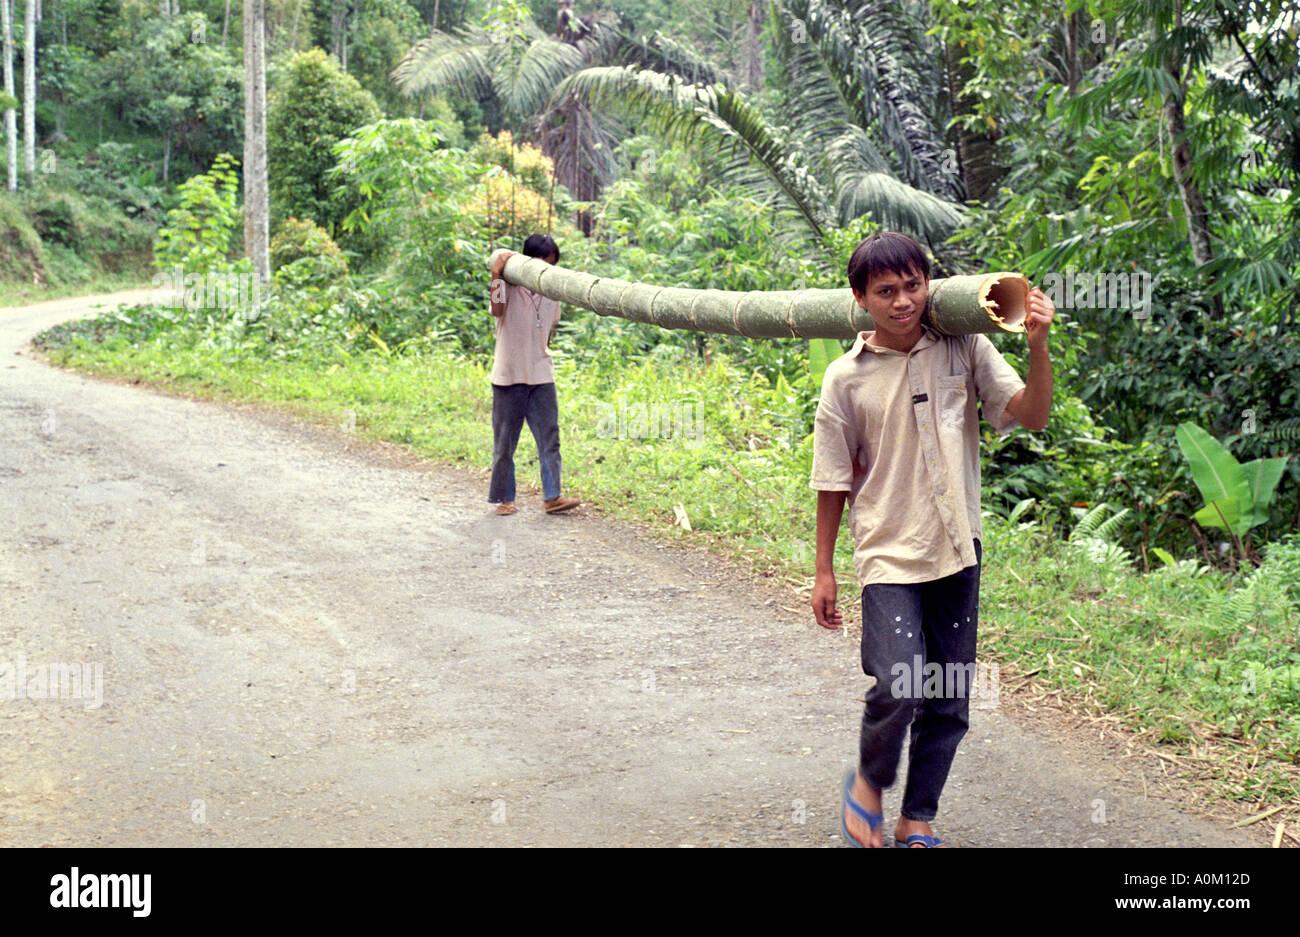 Two boys carrying a large bamboo pole in Tana Toraja Torajaland Sulawesi Celebes Indonesia - Stock Image